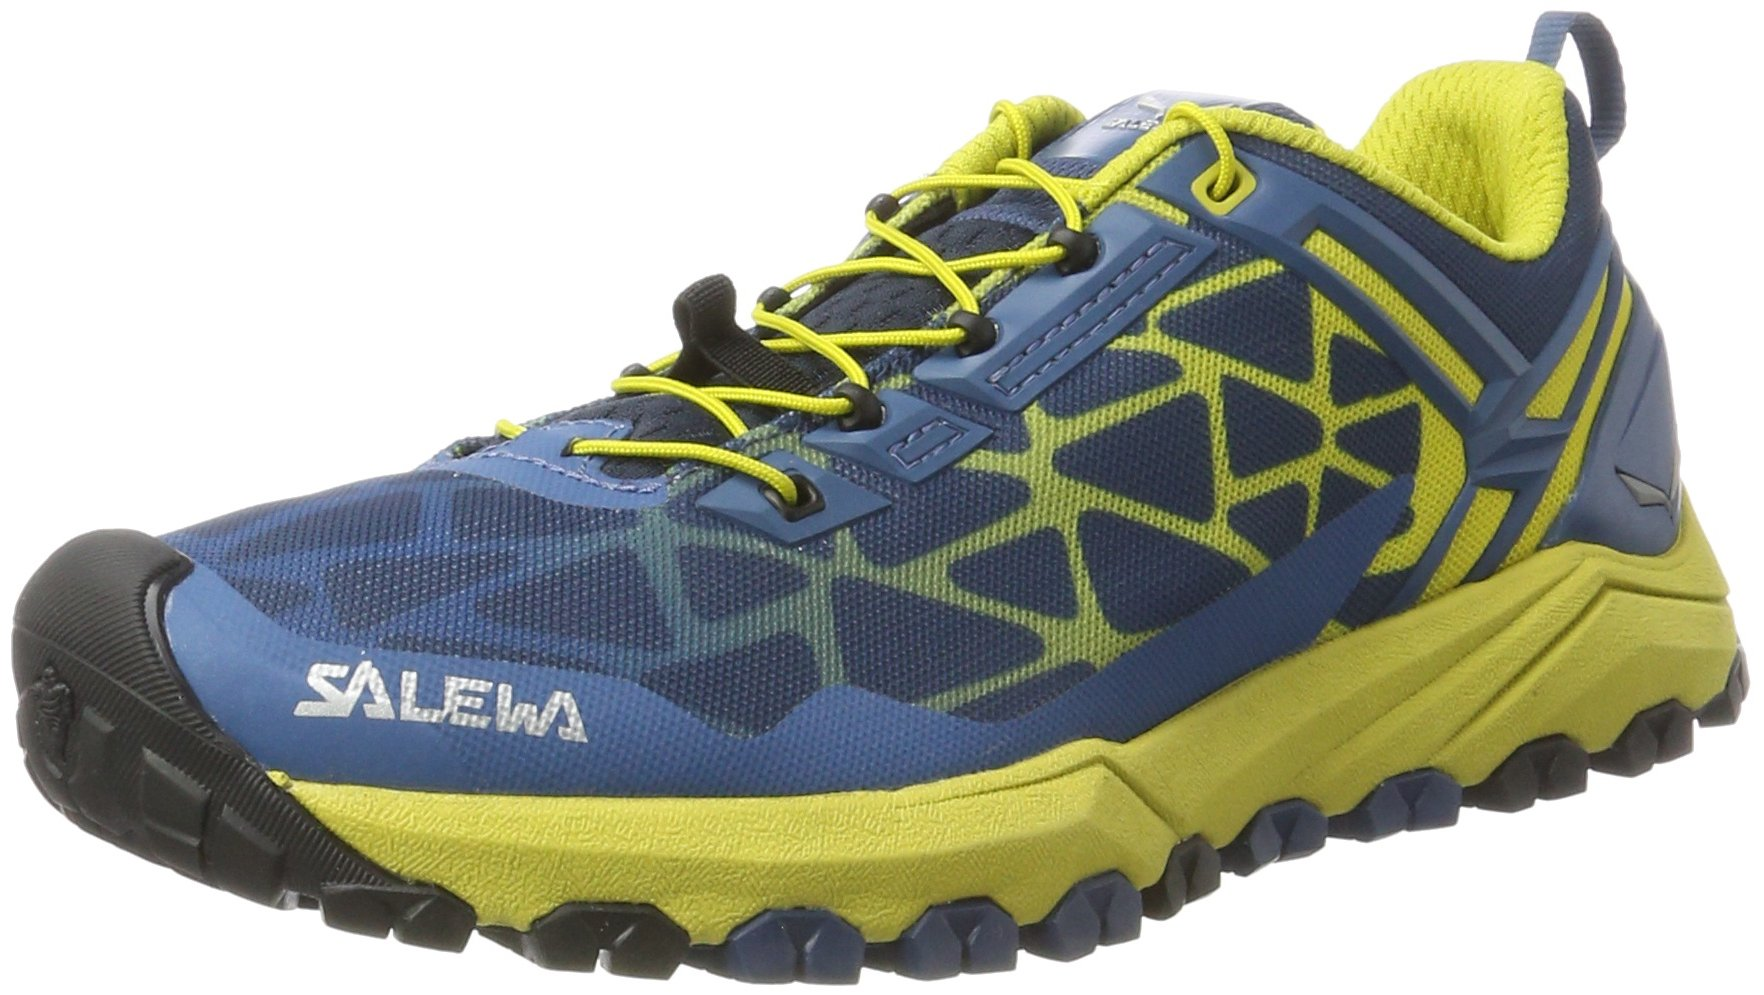 Salewa Men's Multi Track Speed Hiking Shoe, Dark Denim/Kamille, 9.5 D US